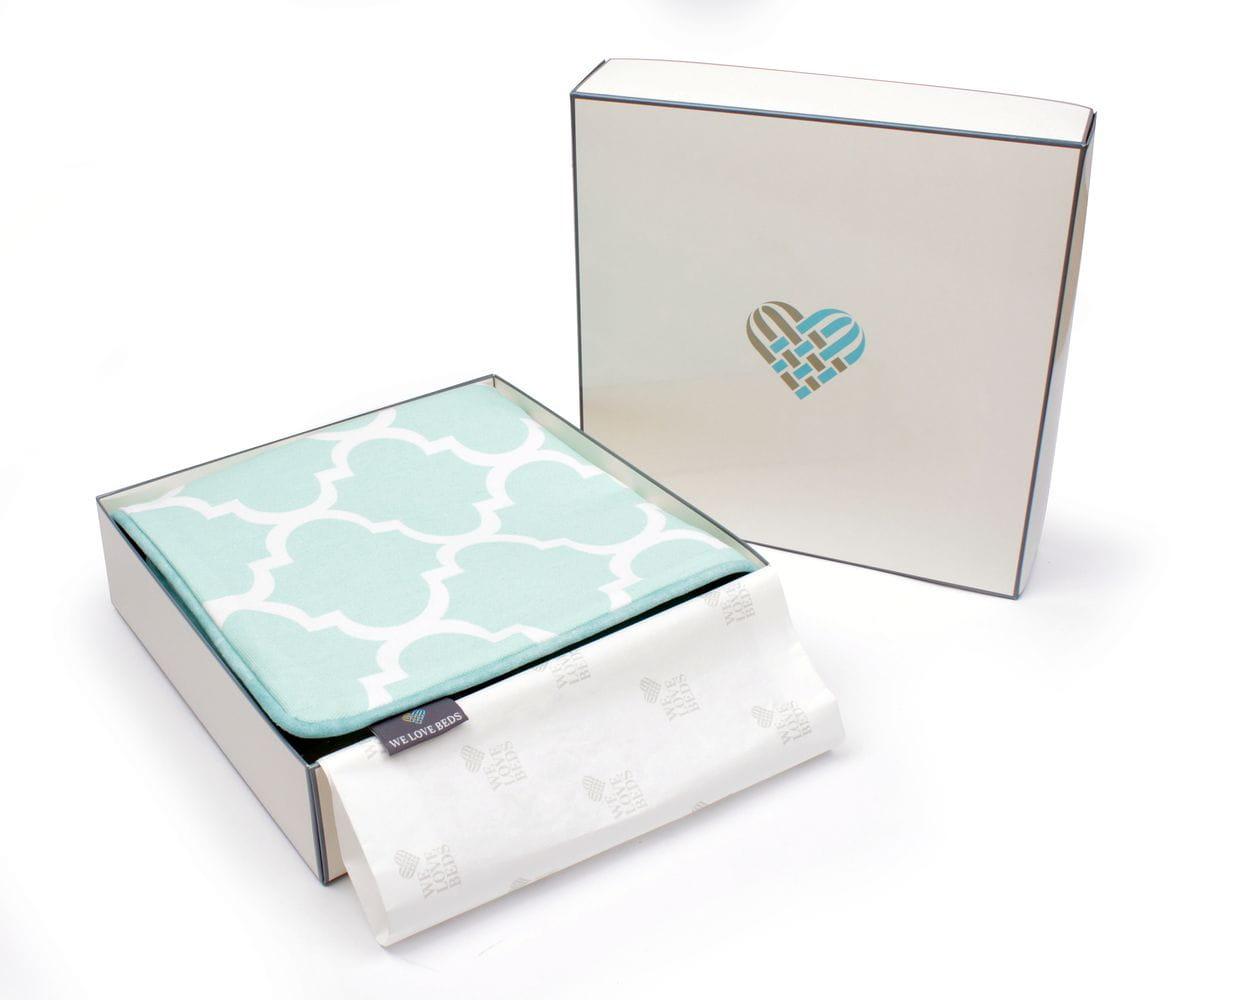 Poduszka dekoracyjna Clover Mint 60x60 cm - We Love Candles&We Love Beds